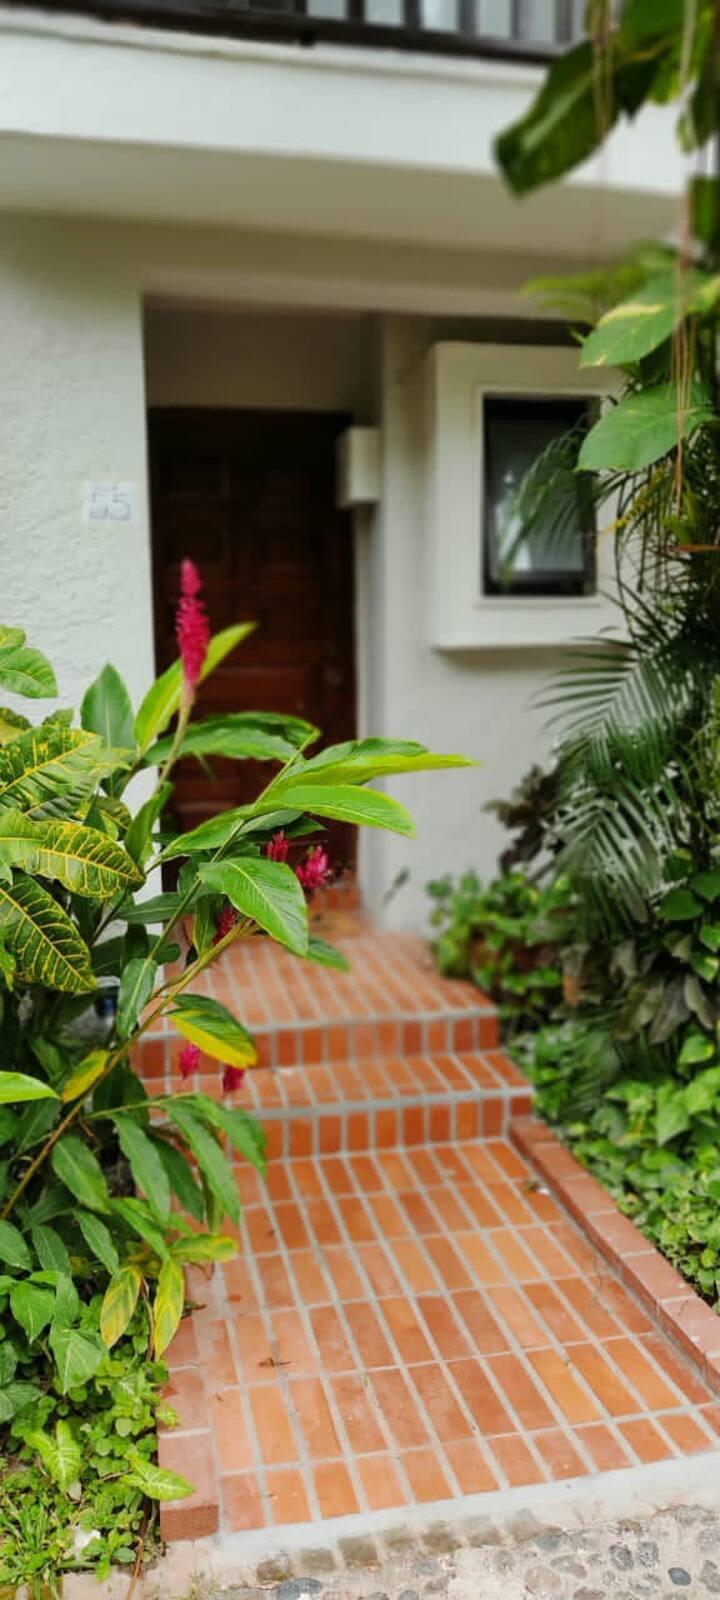 Marina Vallarta, villa completa 3 habitaciones.